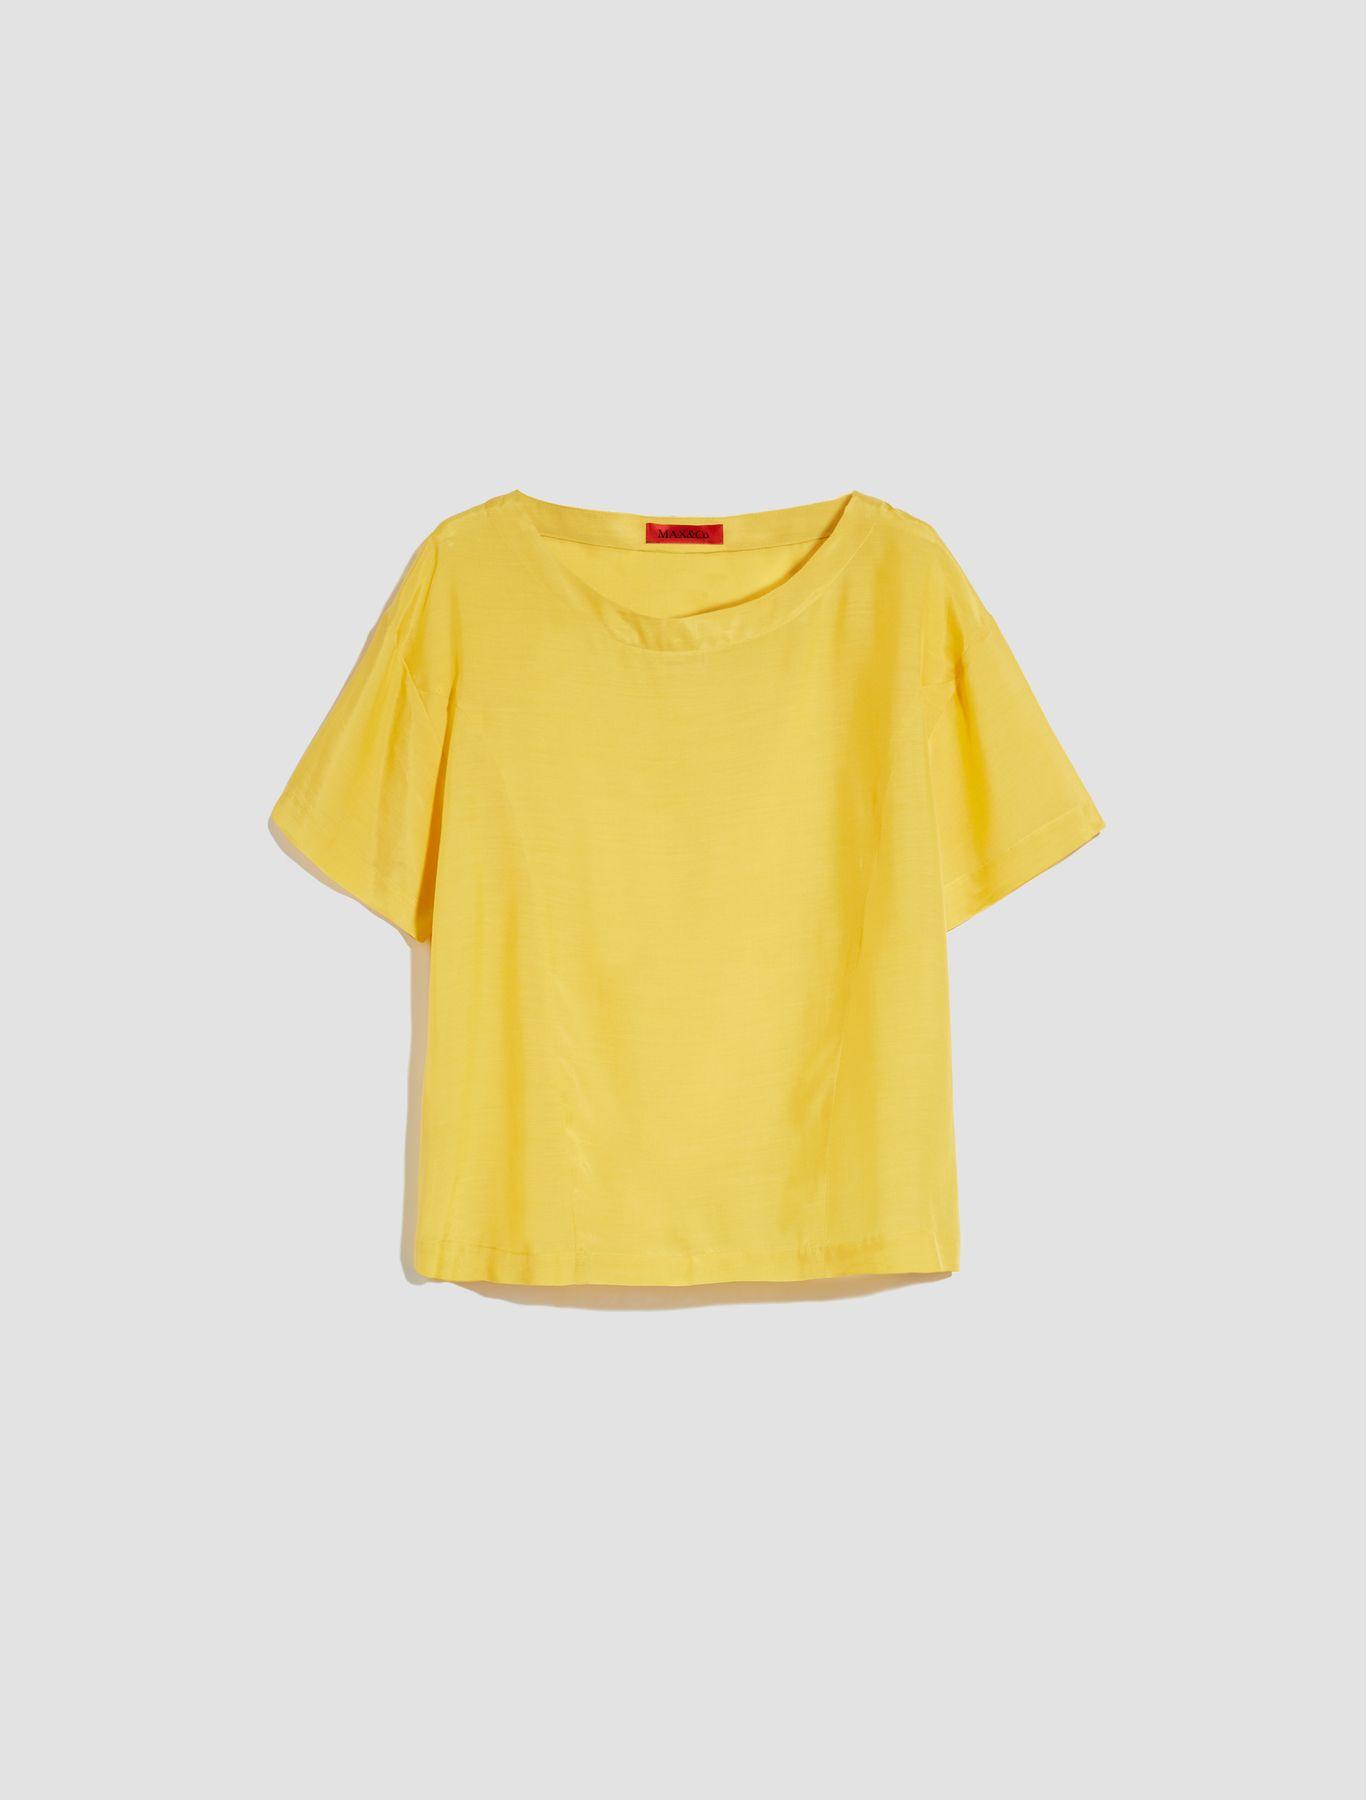 DISPENSA Shirt sunshine yellow 5